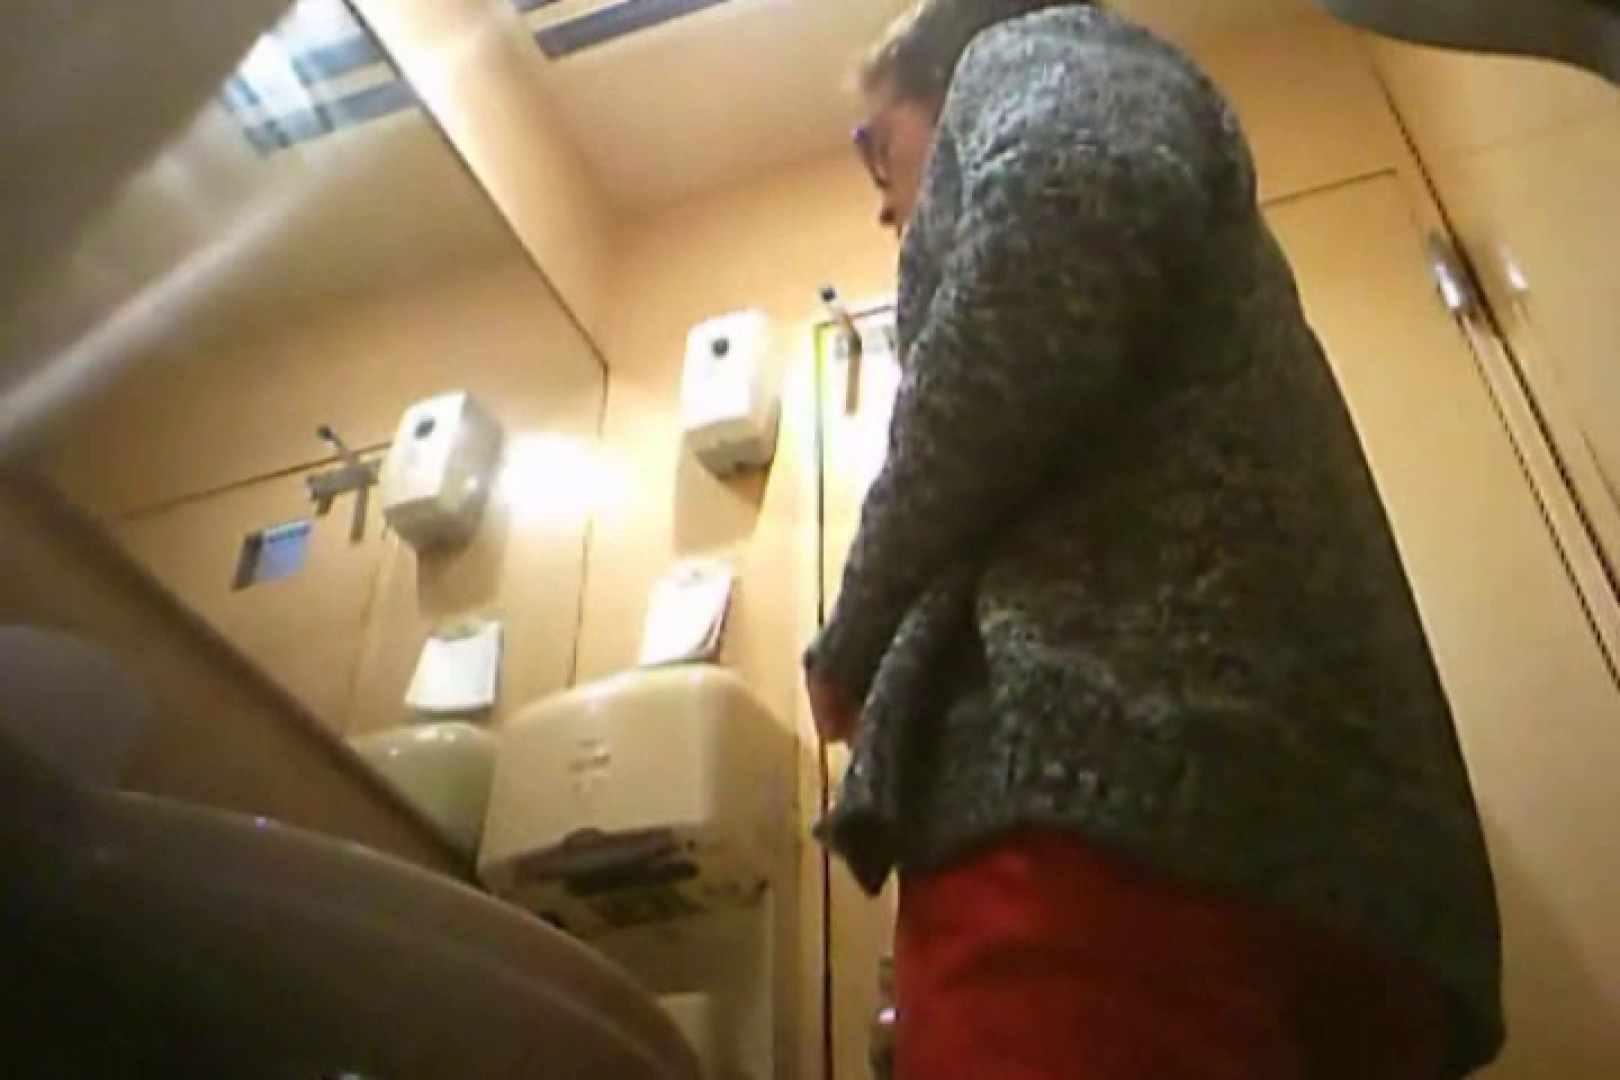 SEASON 3rd!掴み取りさんの洗面所覗き!in新幹線!VOL.21 覗きお宝 ゲイエロ動画 108連発 93